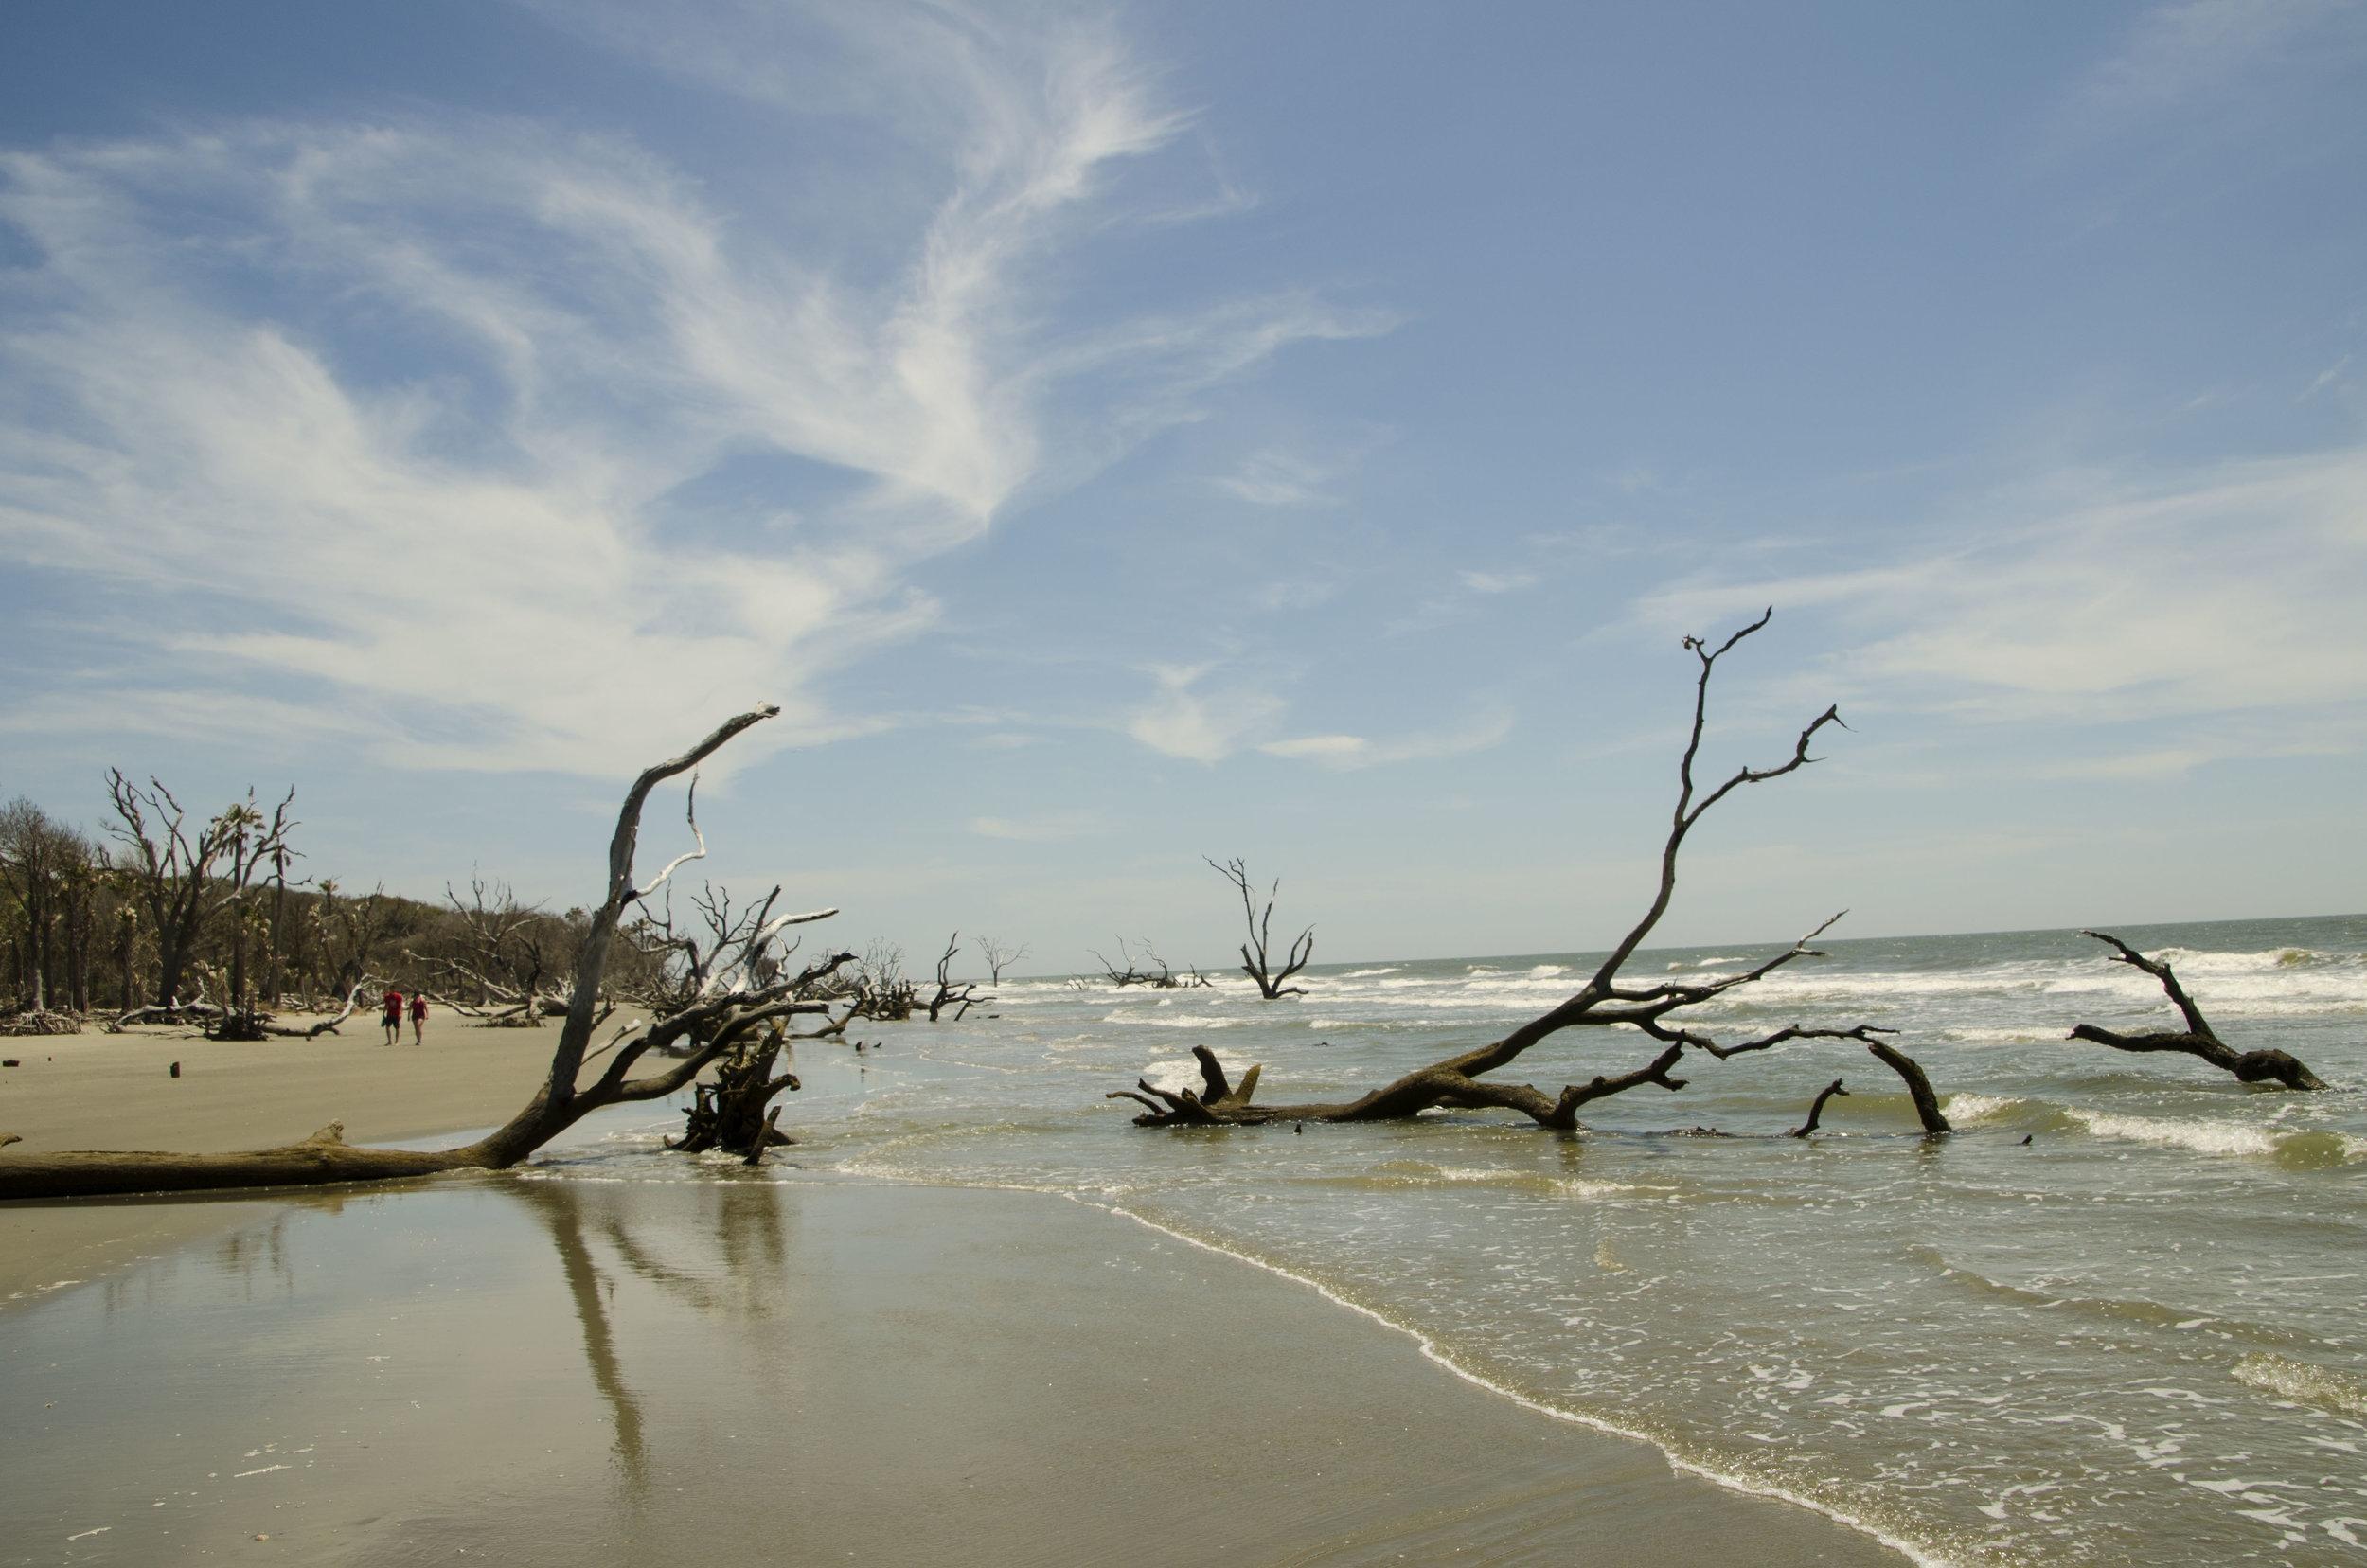 Exploring Bulls Island's miles of deserted boneyard beach.